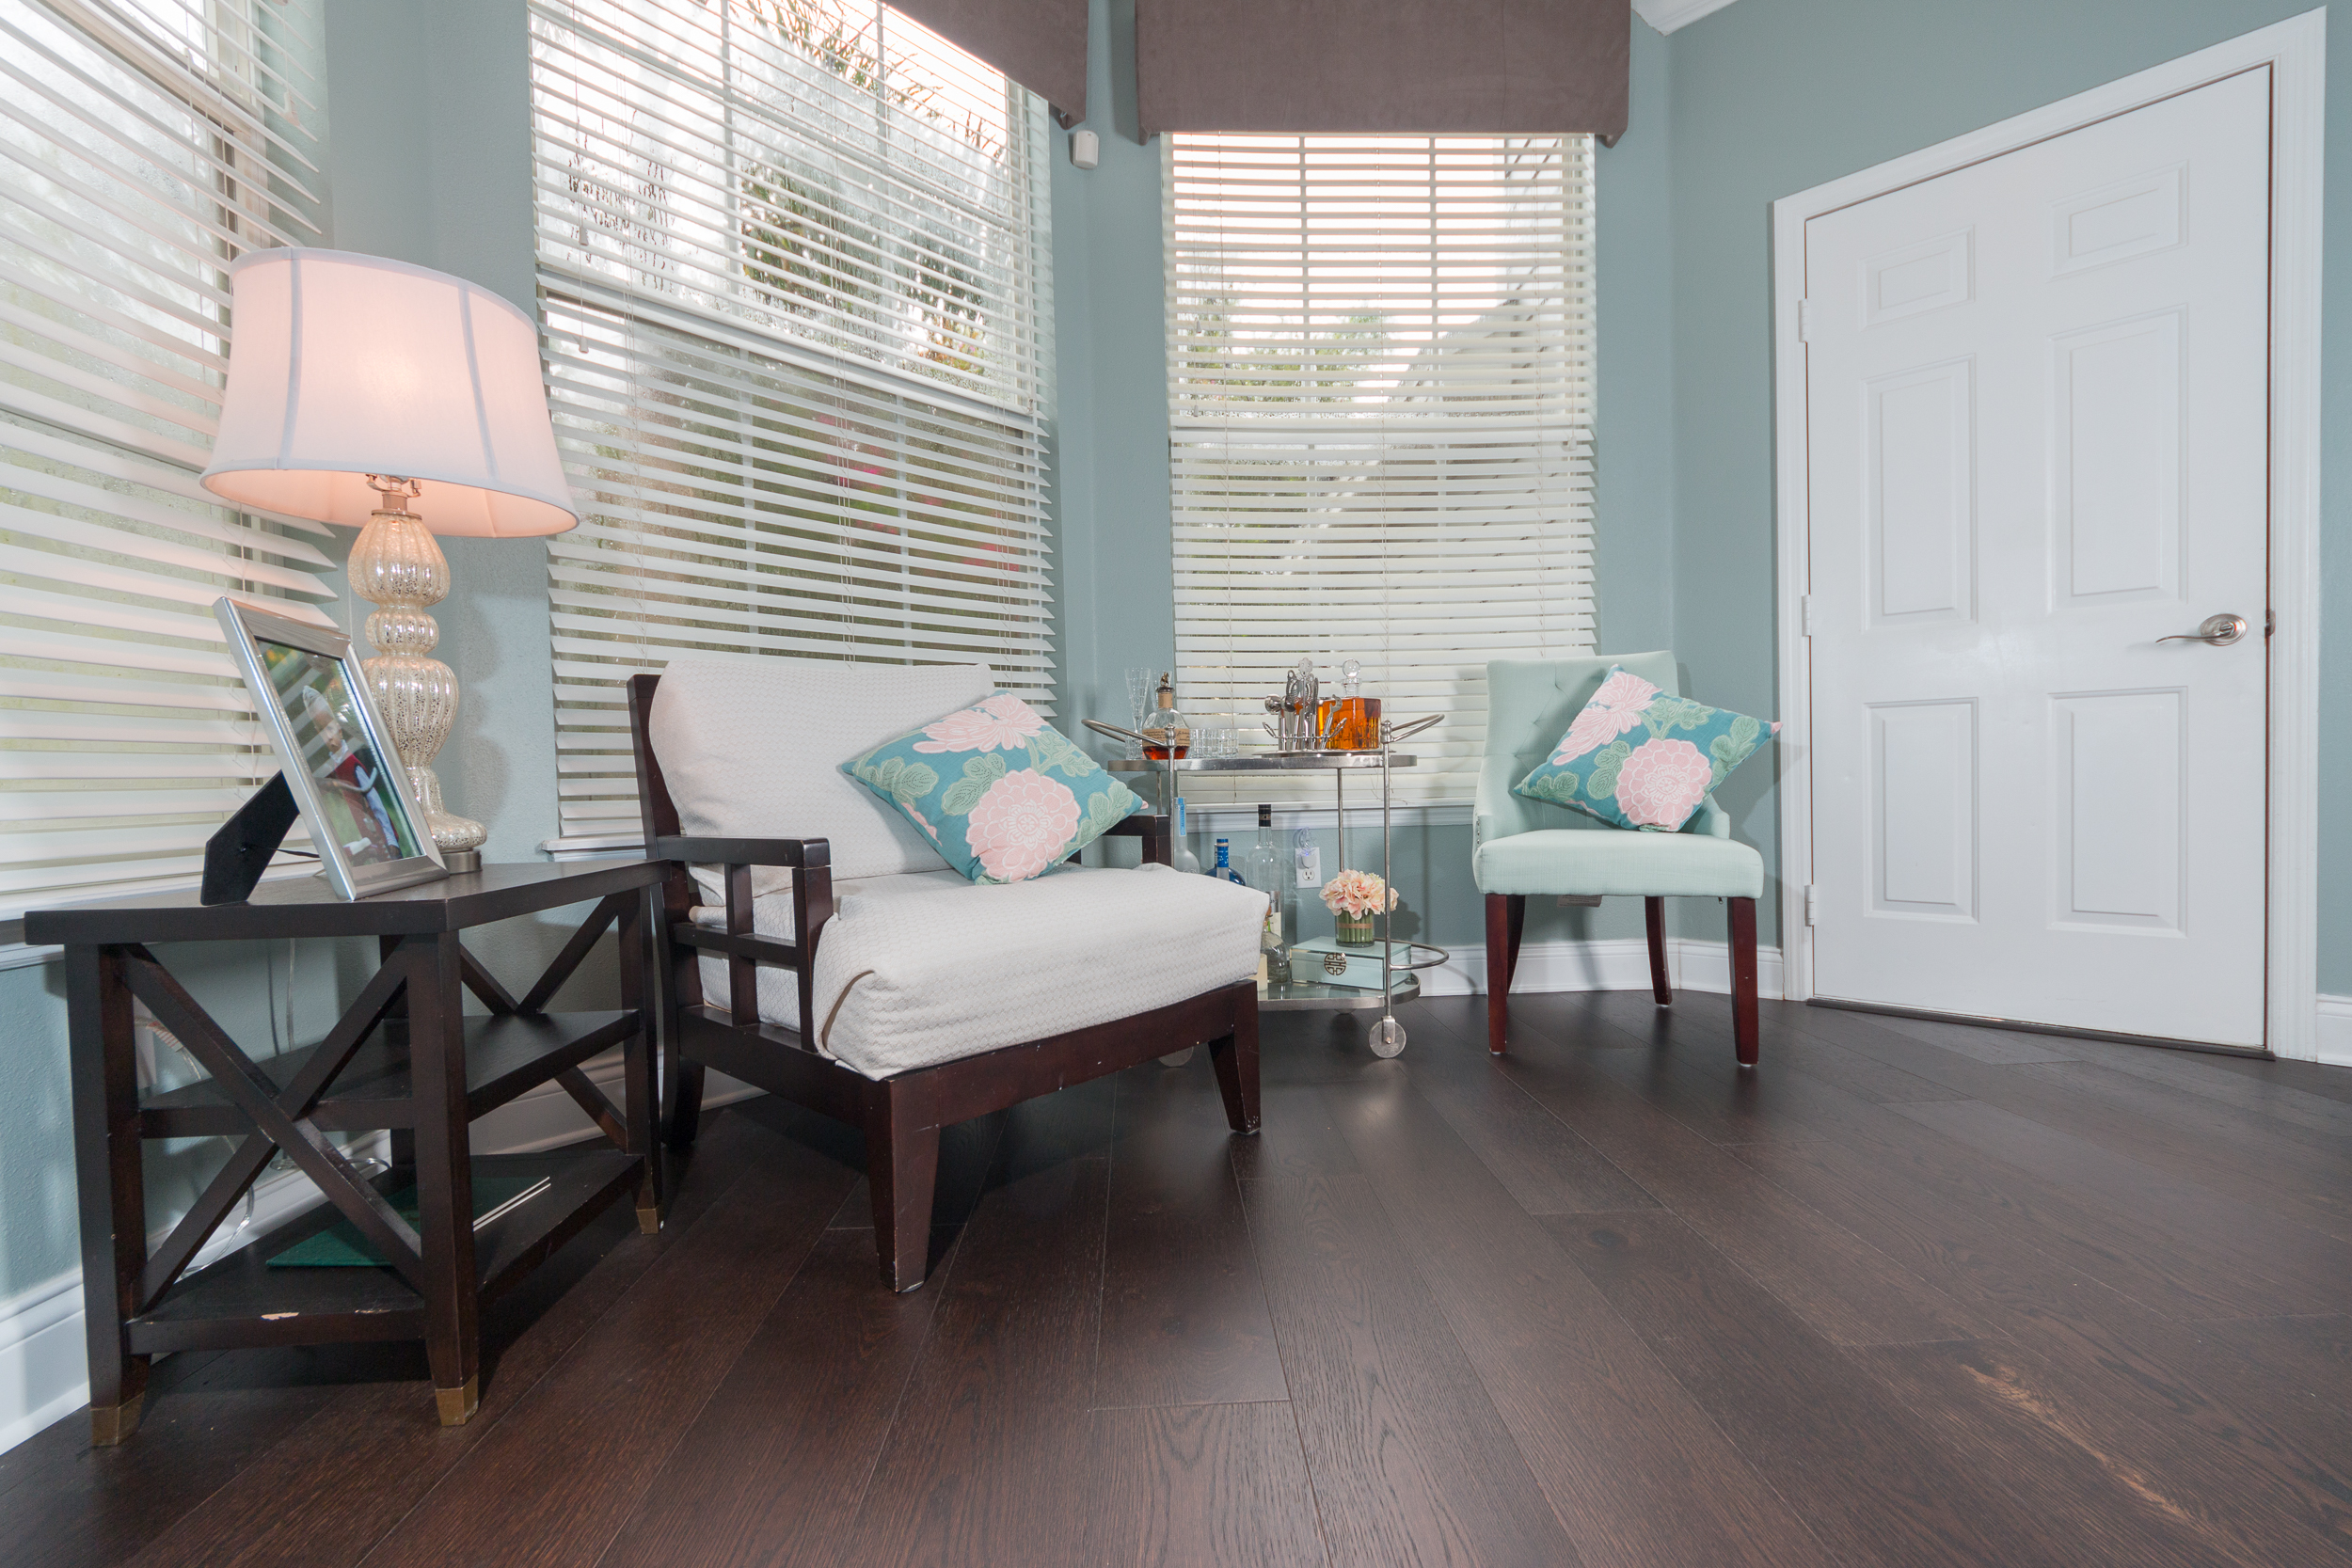 Mellow Oak Wood Flooring with teal walls